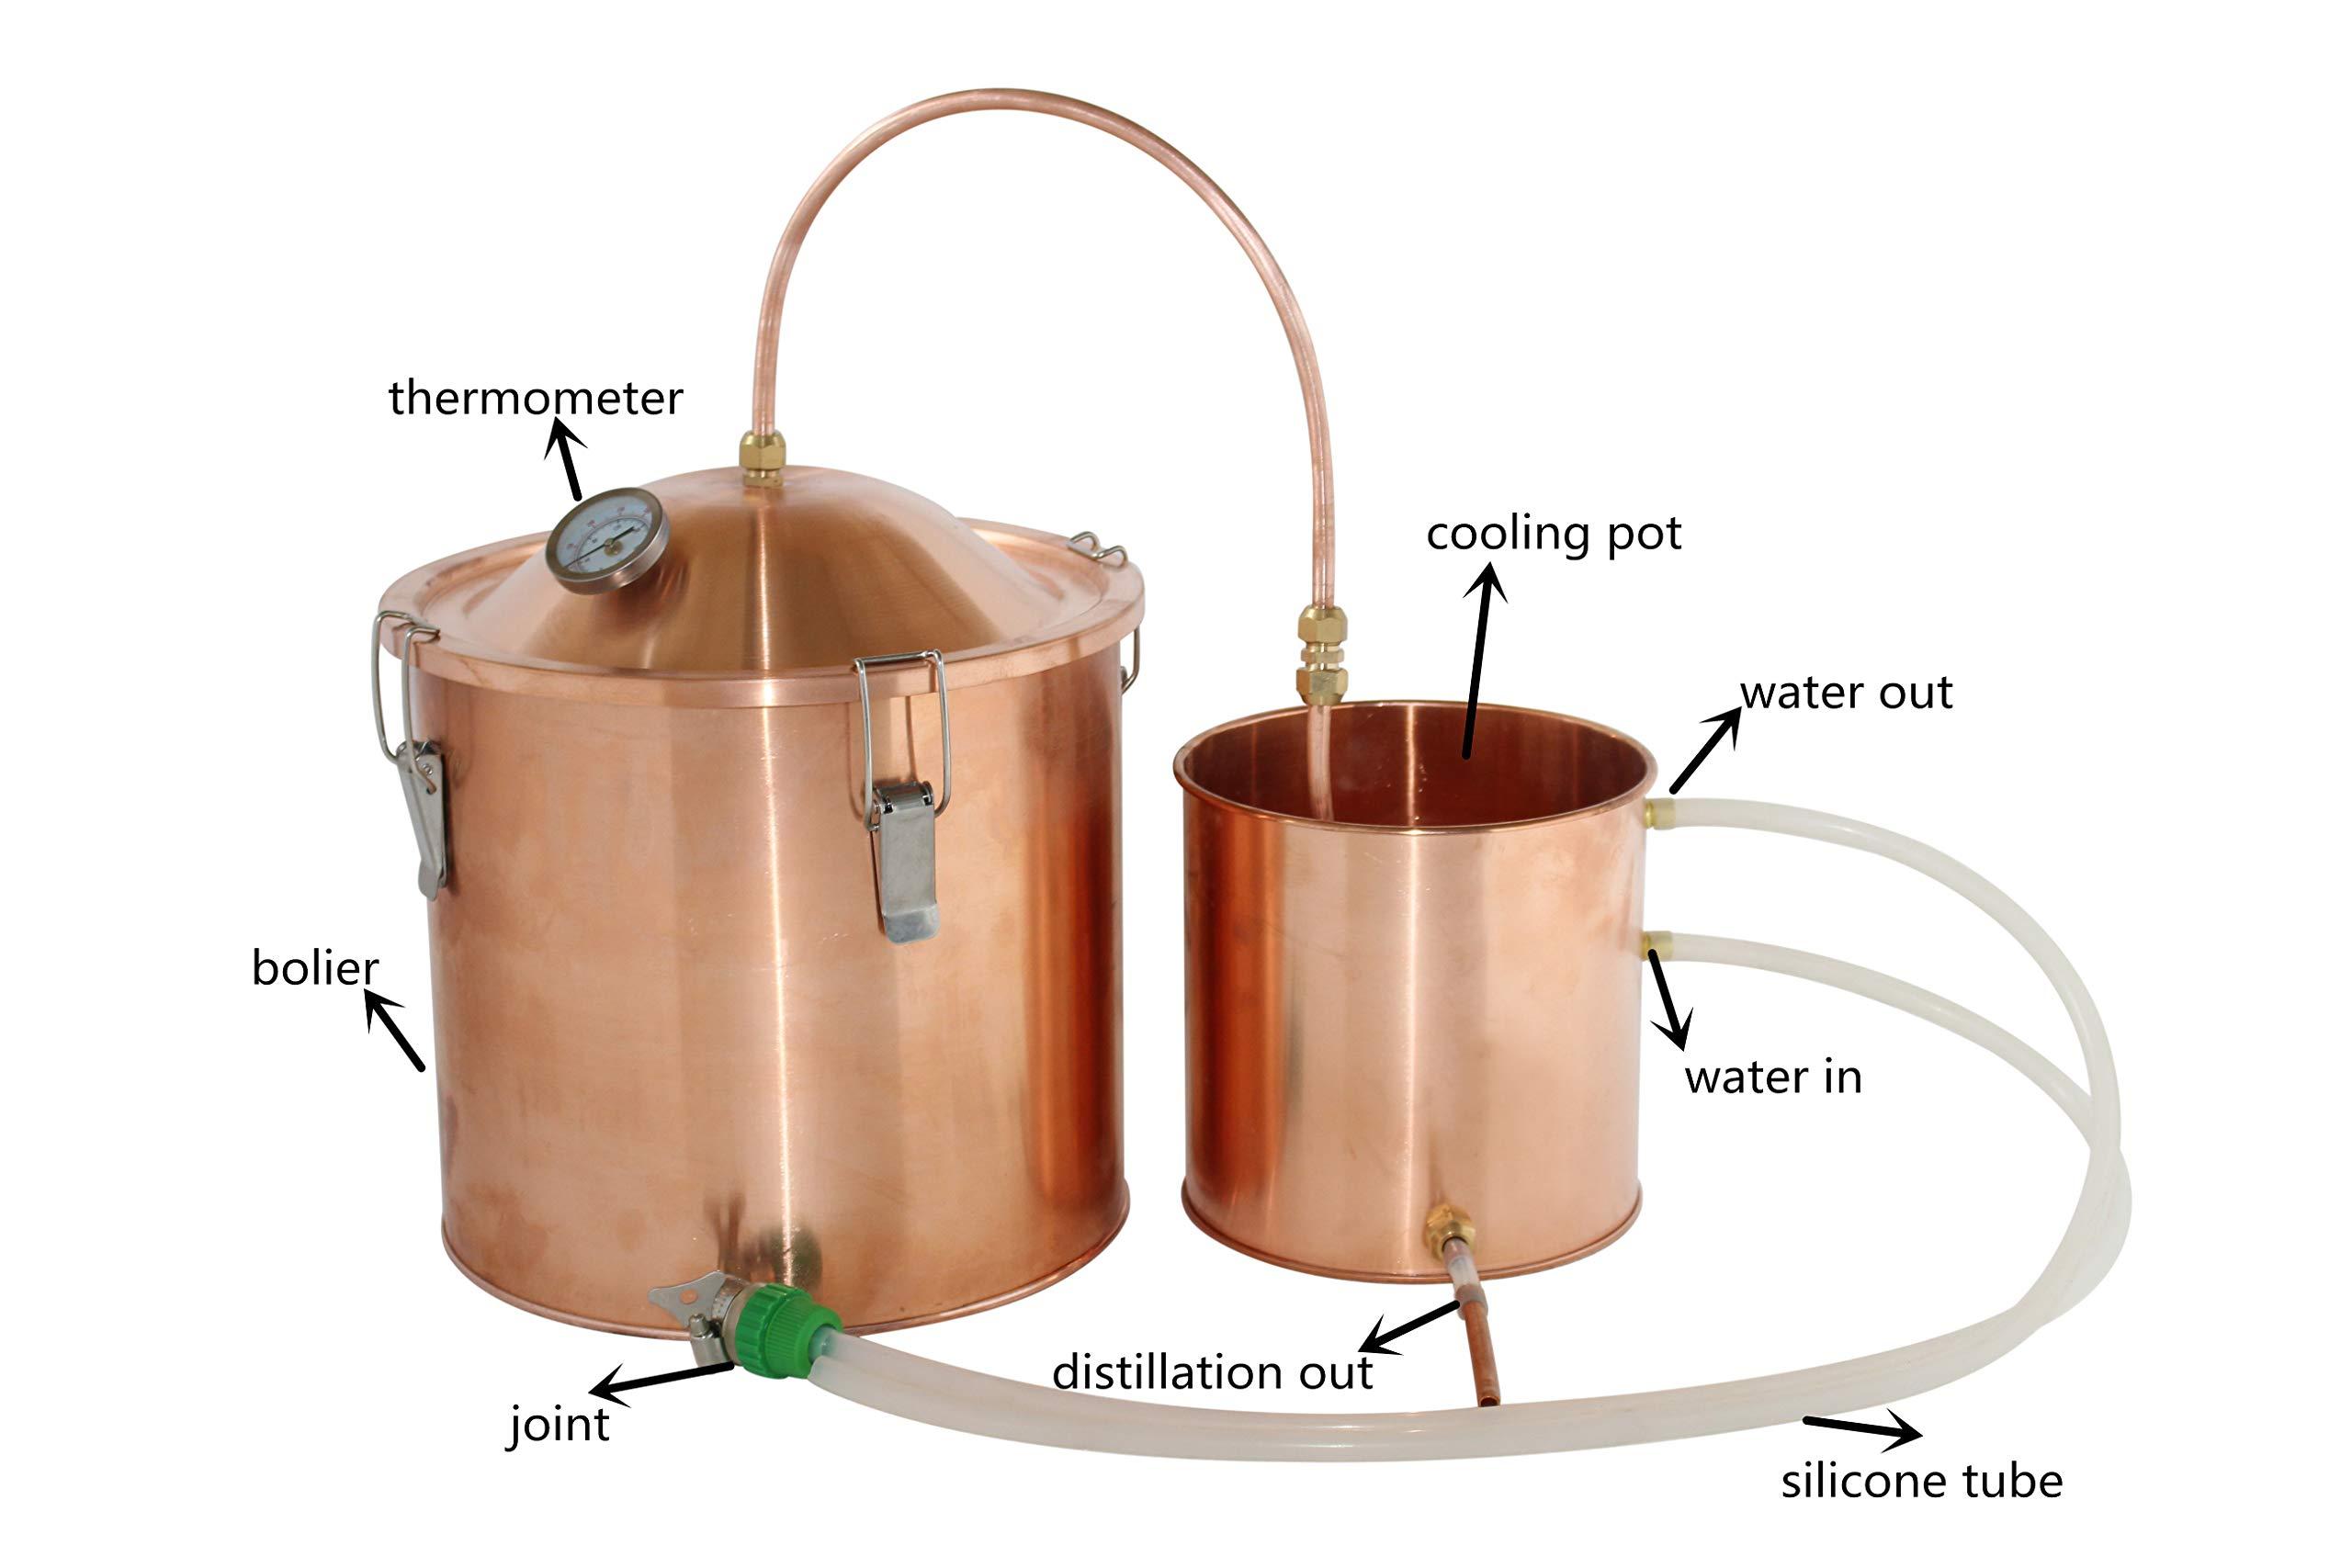 NEW 3gal/10L Water Distiller Copper Pot Moonshine Still Boiler Home Brew Kit